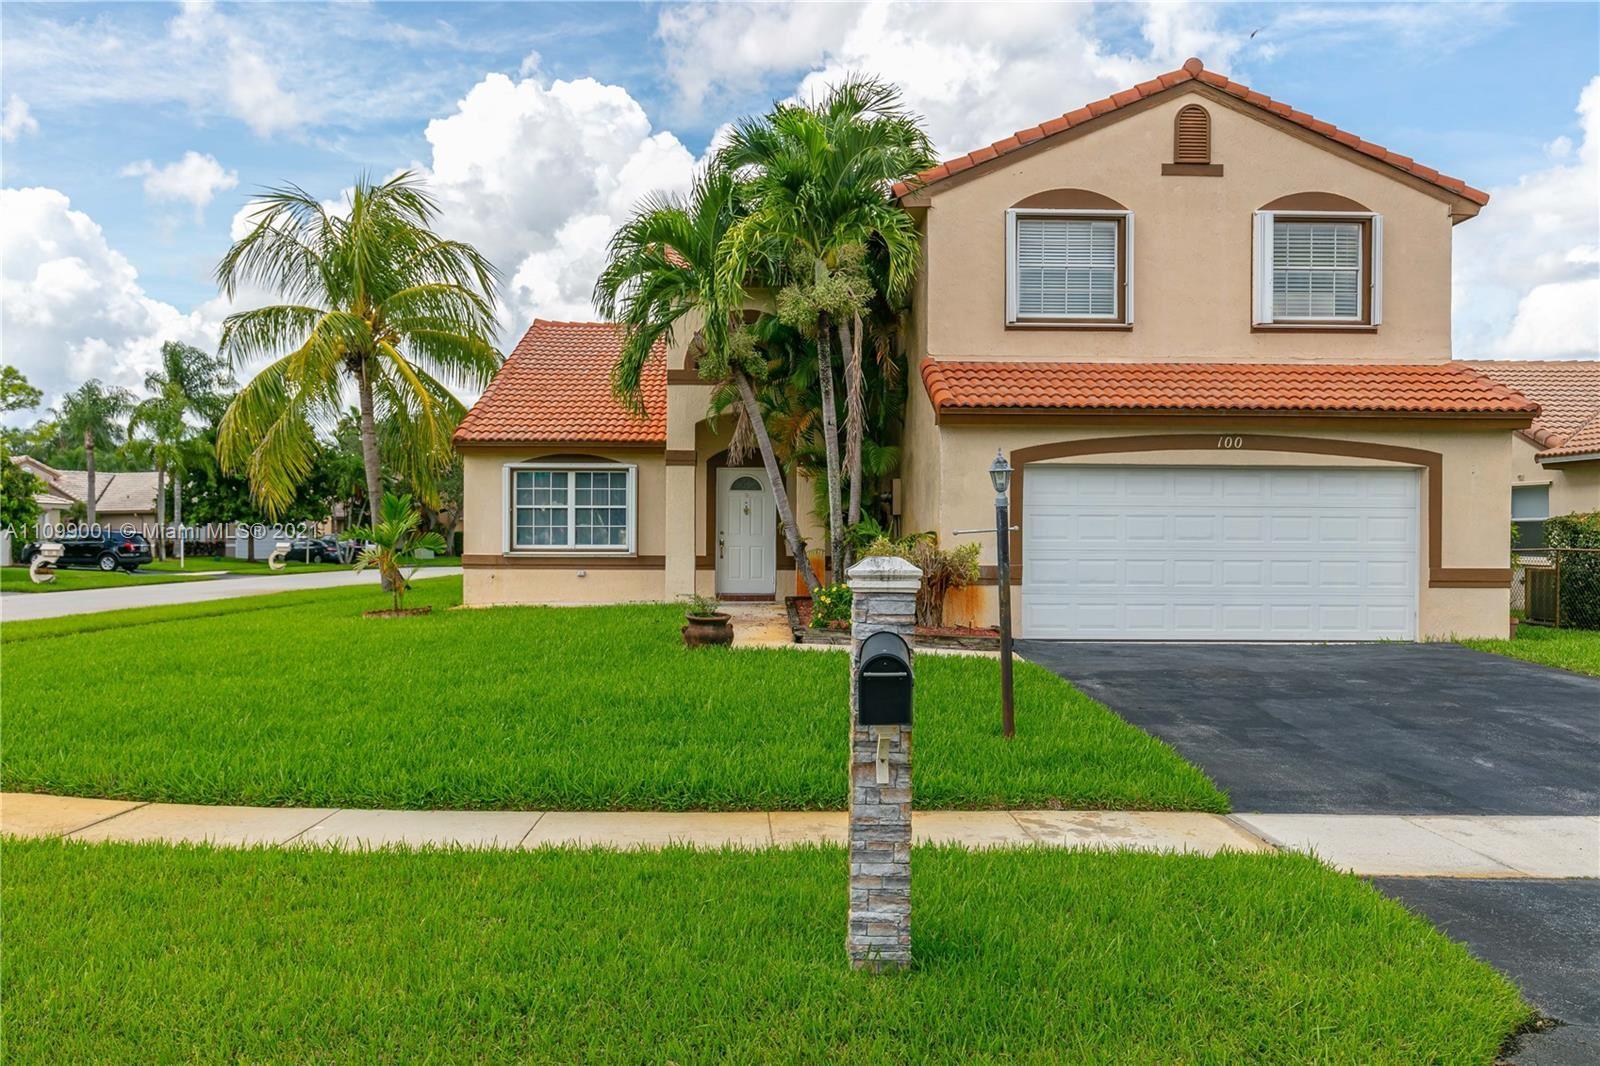 100 NW 189th Ave, Pembroke Pines, FL 33029 - #: A11099001